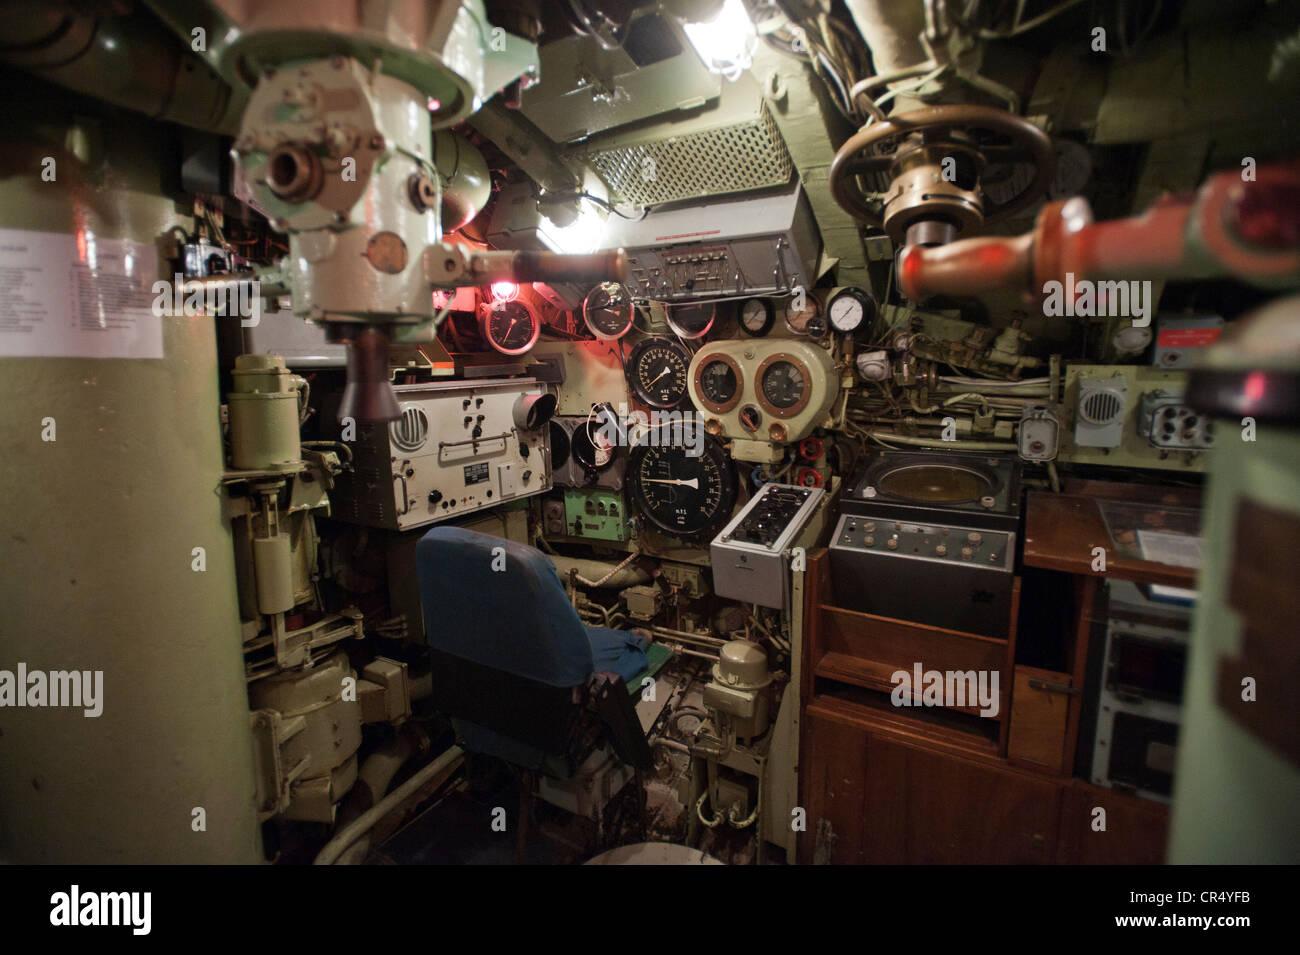 Submarine boat, command centre, Maritime and Naval Museum, Aalborg, North Jutland region, Denmark, Europe - Stock Image